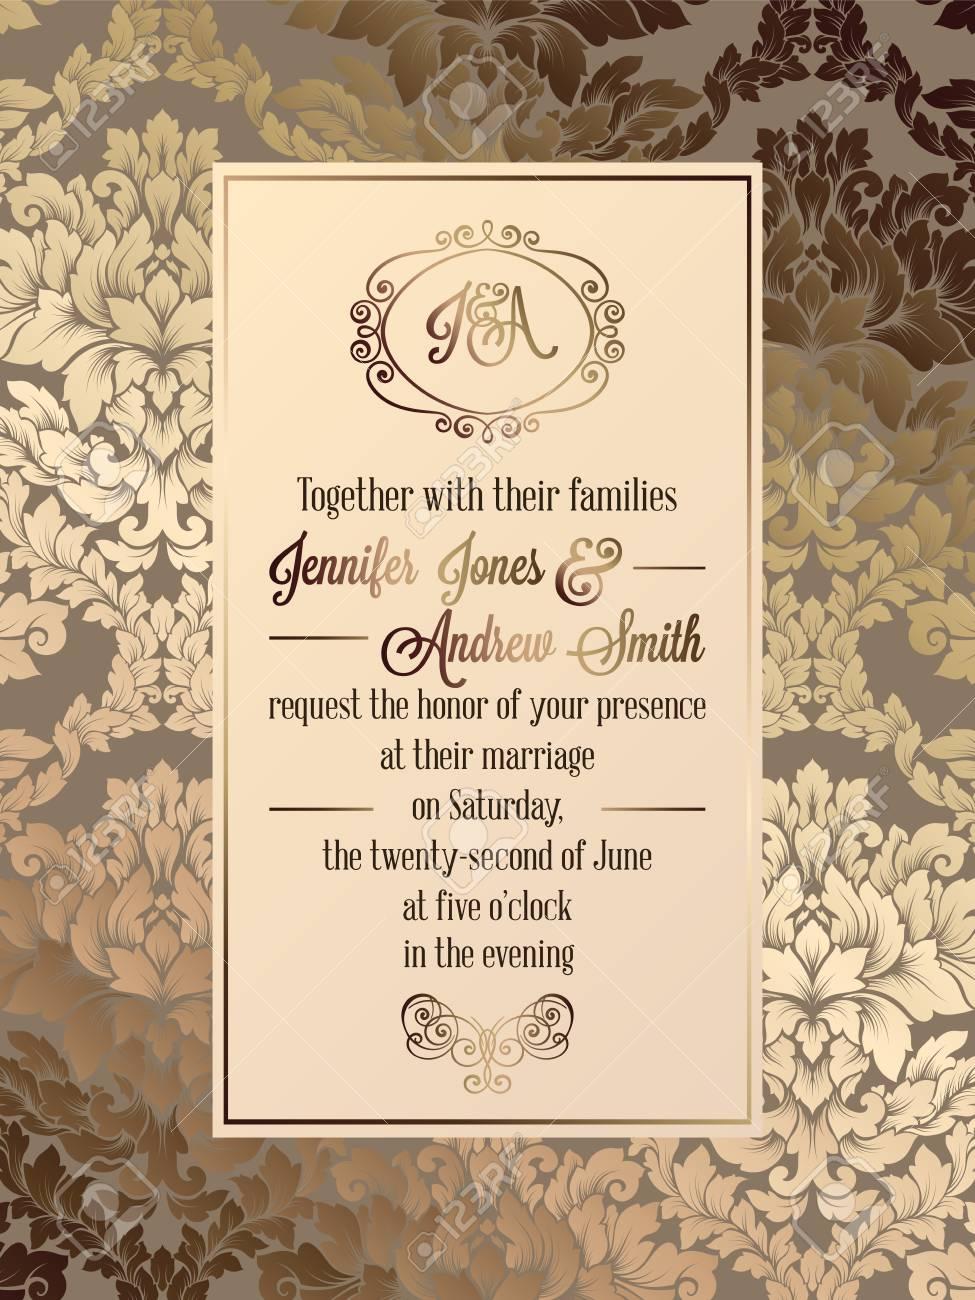 Vintage baroque style wedding invitation card template.. Elegant..